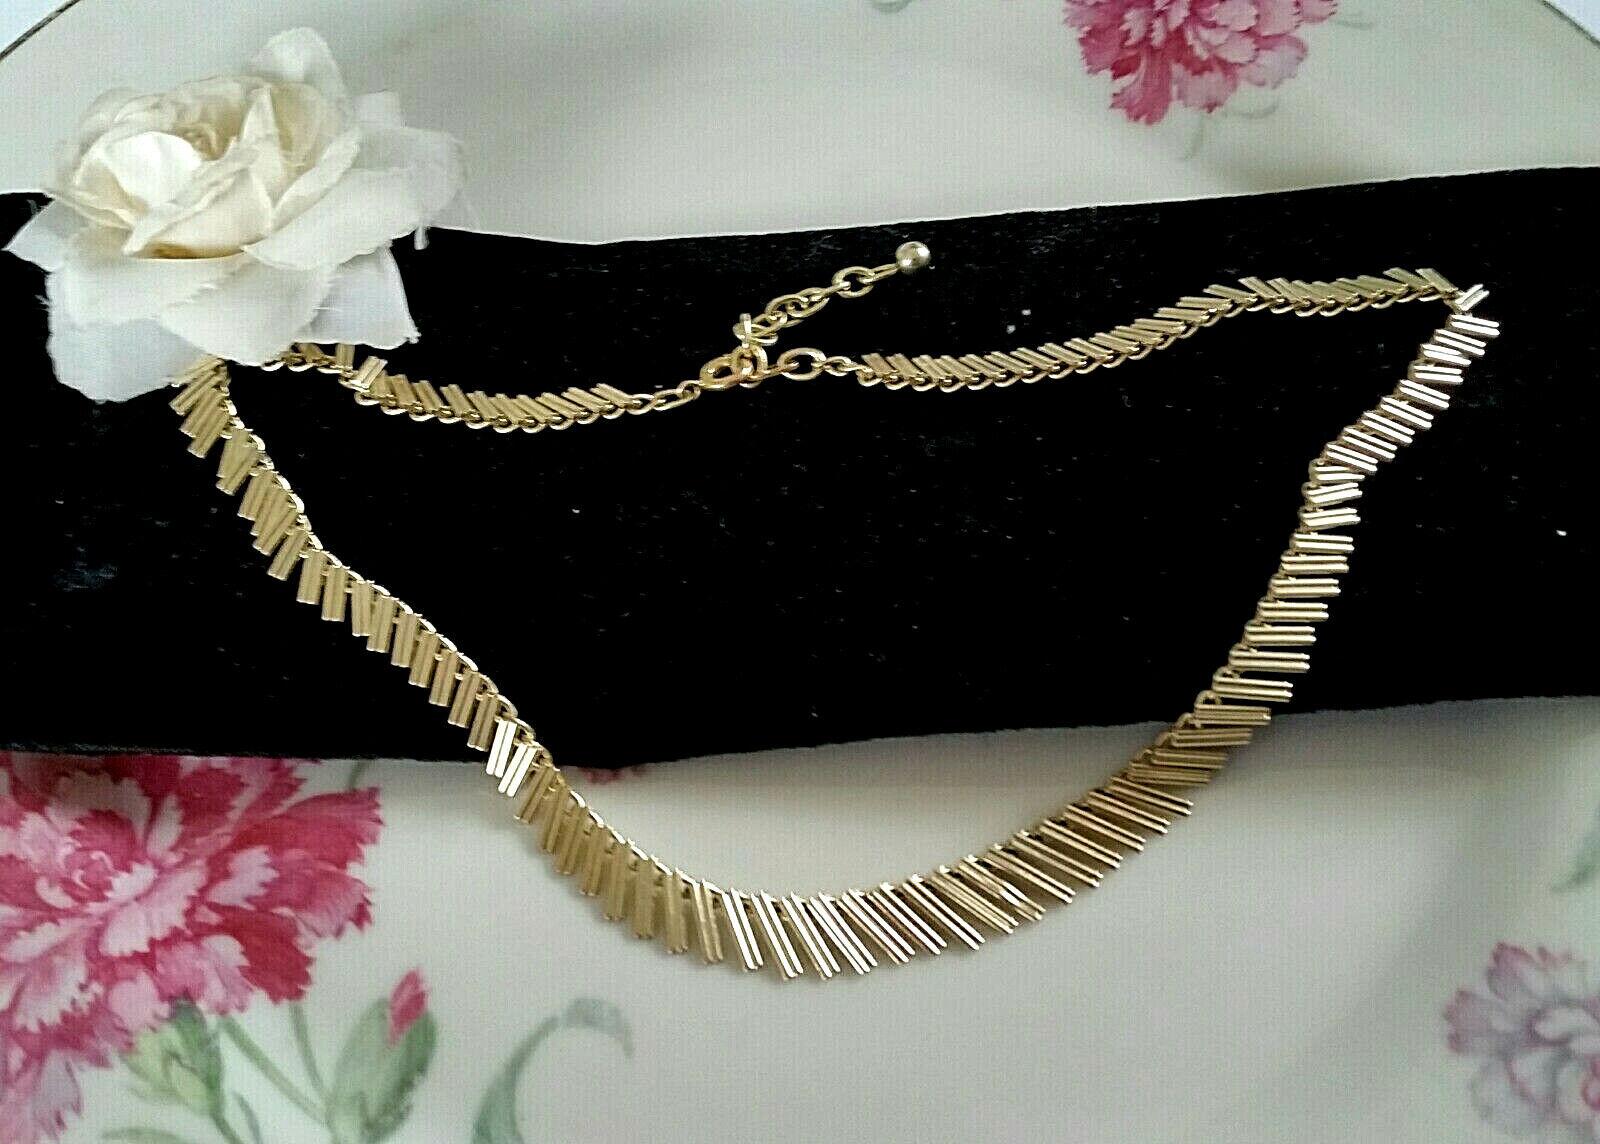 Vintage zierliche 60er Jahre Kette Collier 43 cm Americ Gold Double